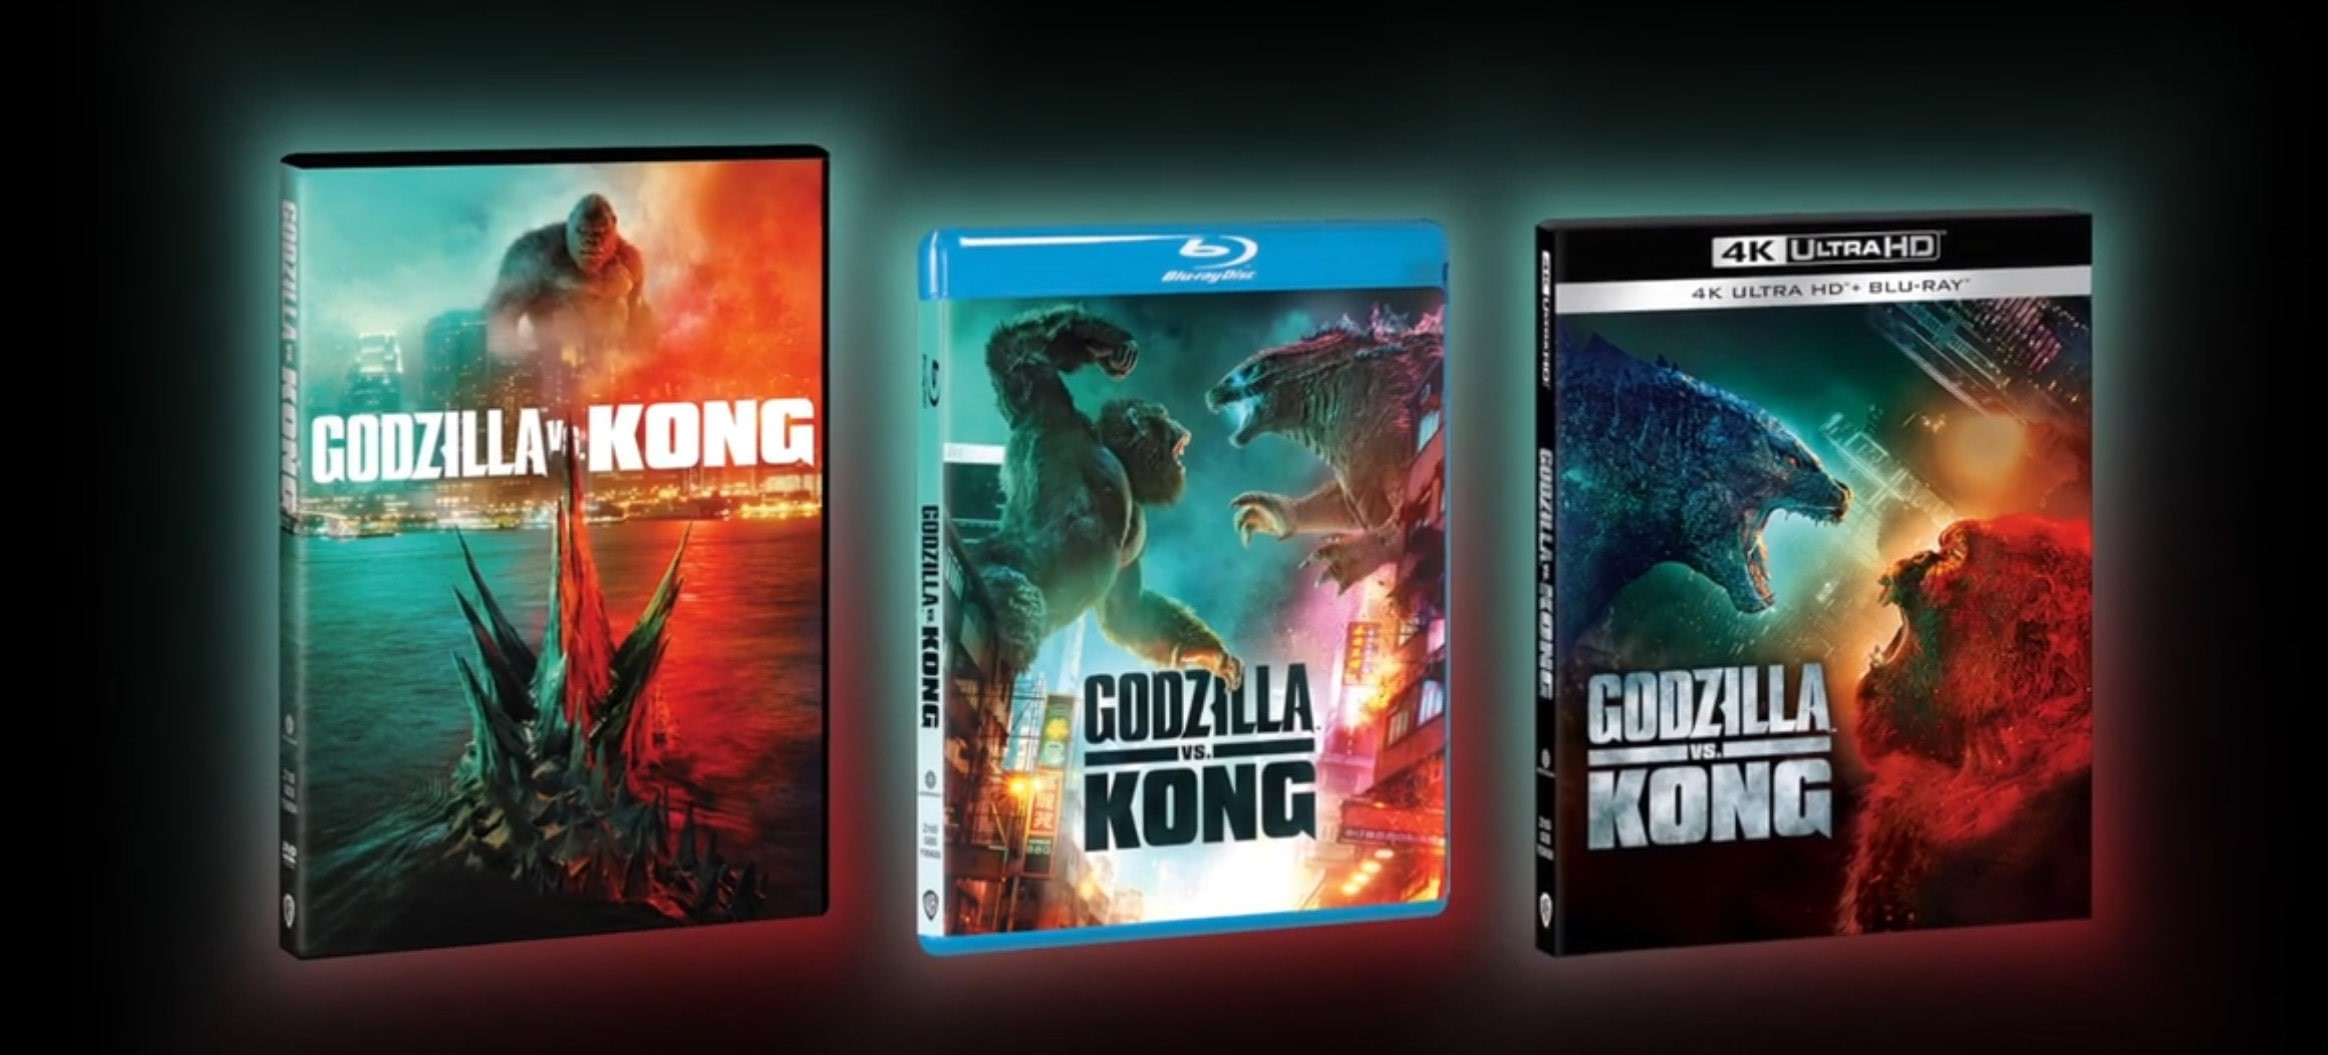 godzilla vs kong wydania DVD, Blu-ray i 4K UHD